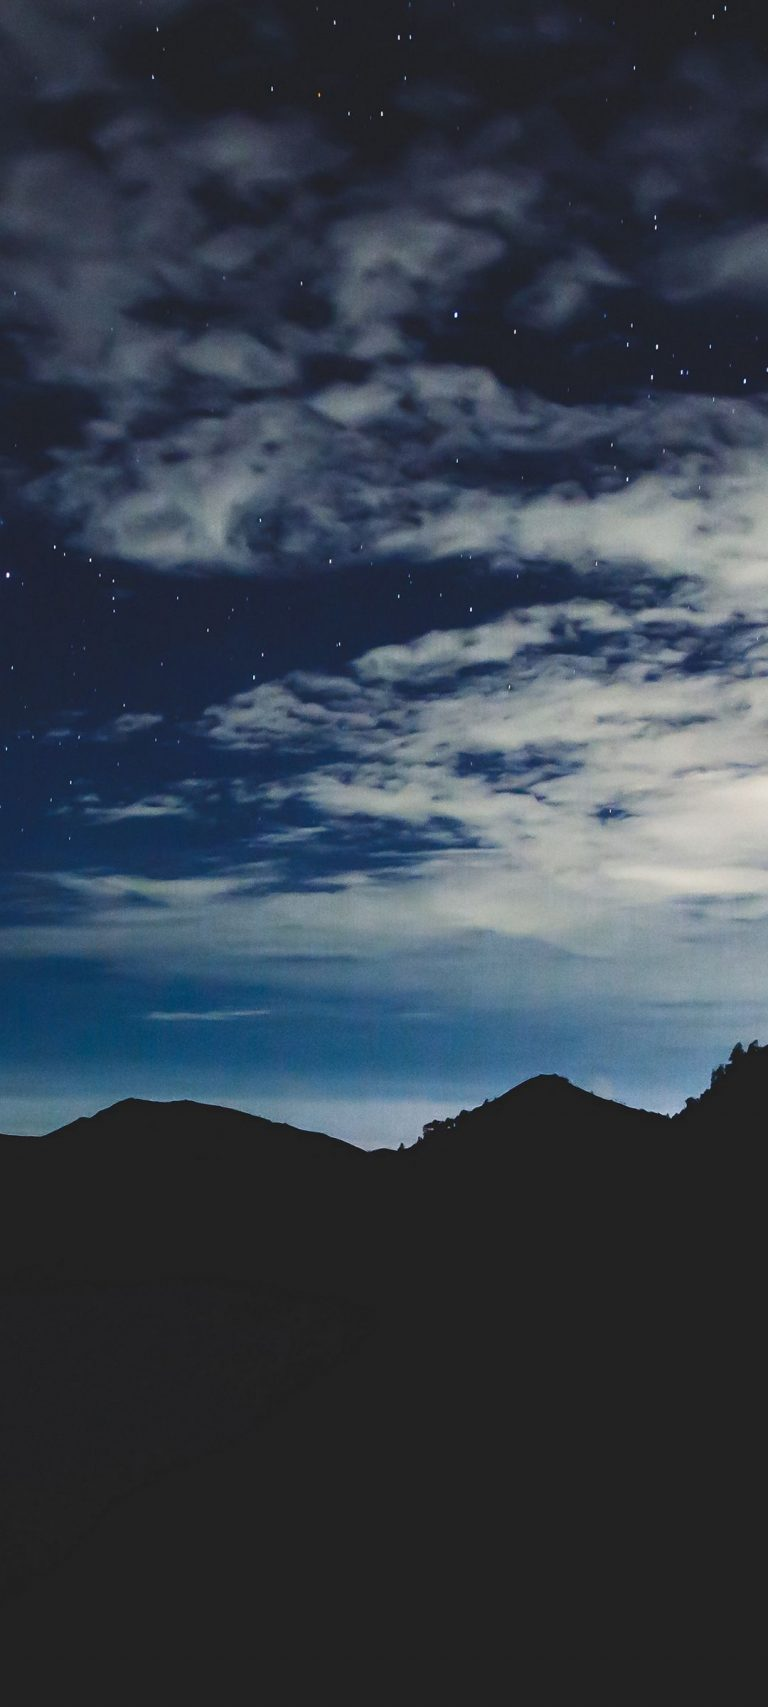 Stars Night Sky Mountains 1080x2400 768x1707